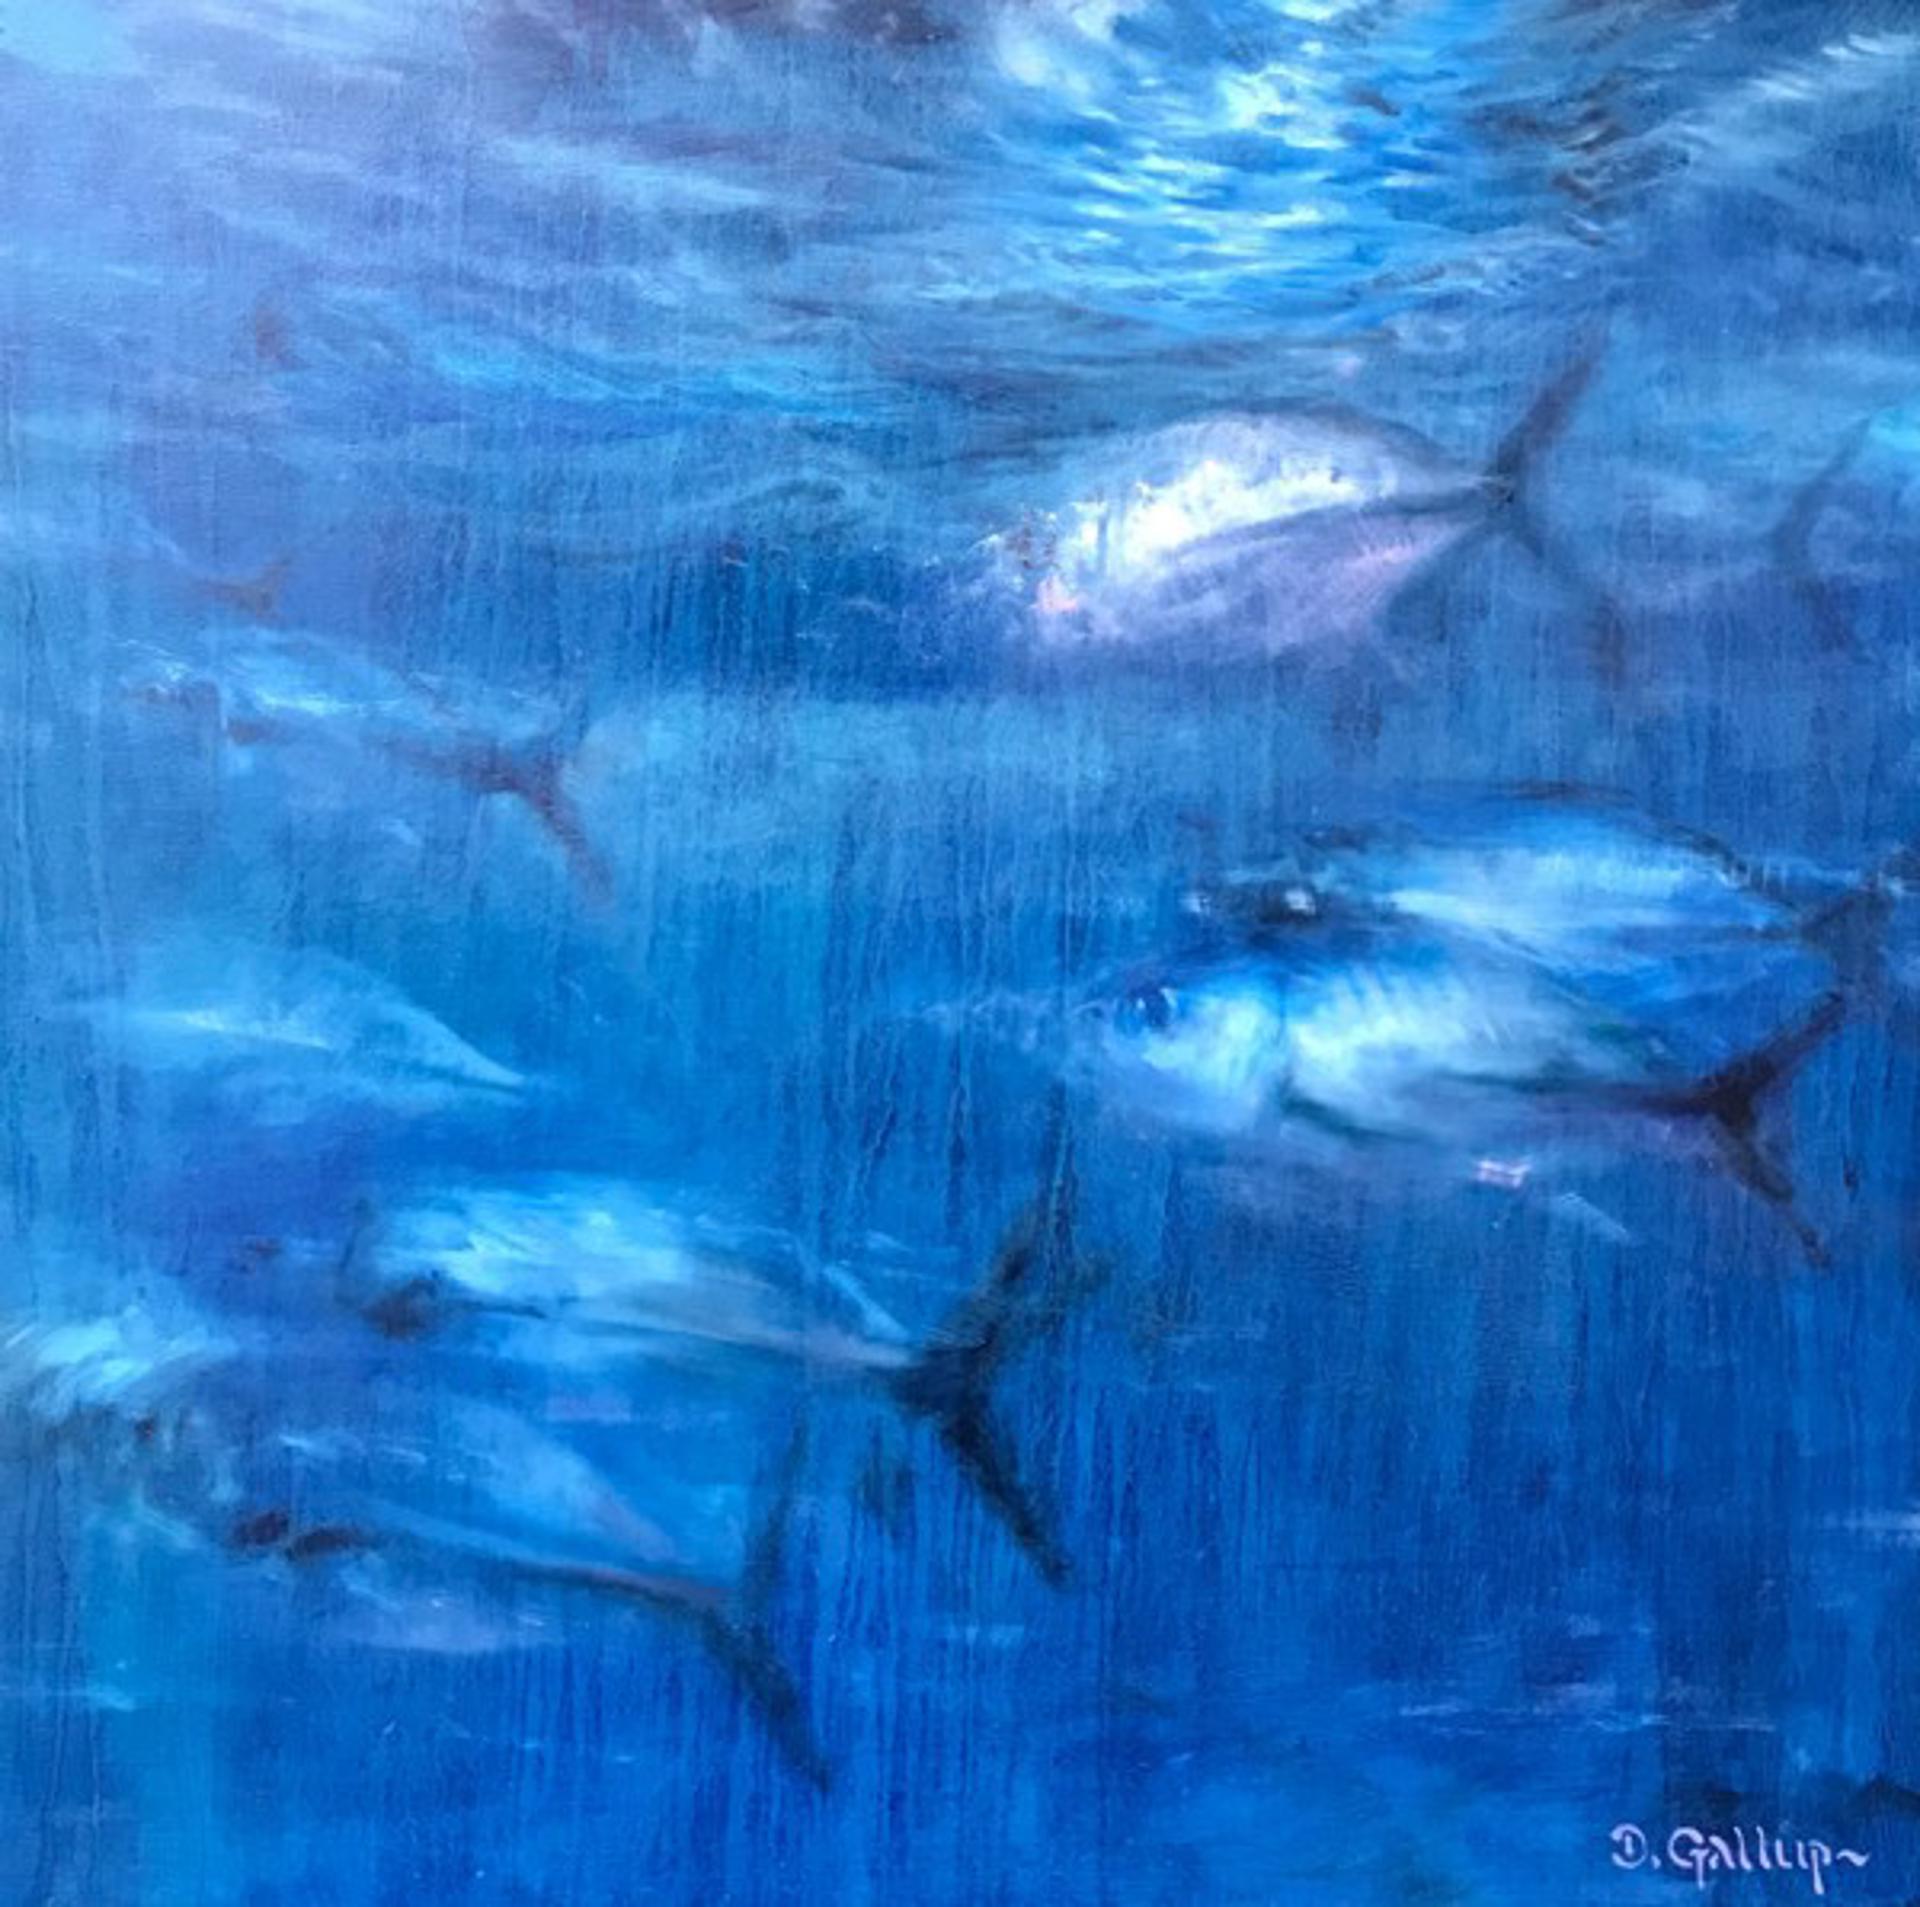 Blue Trevally in Moonlight by David Gallup